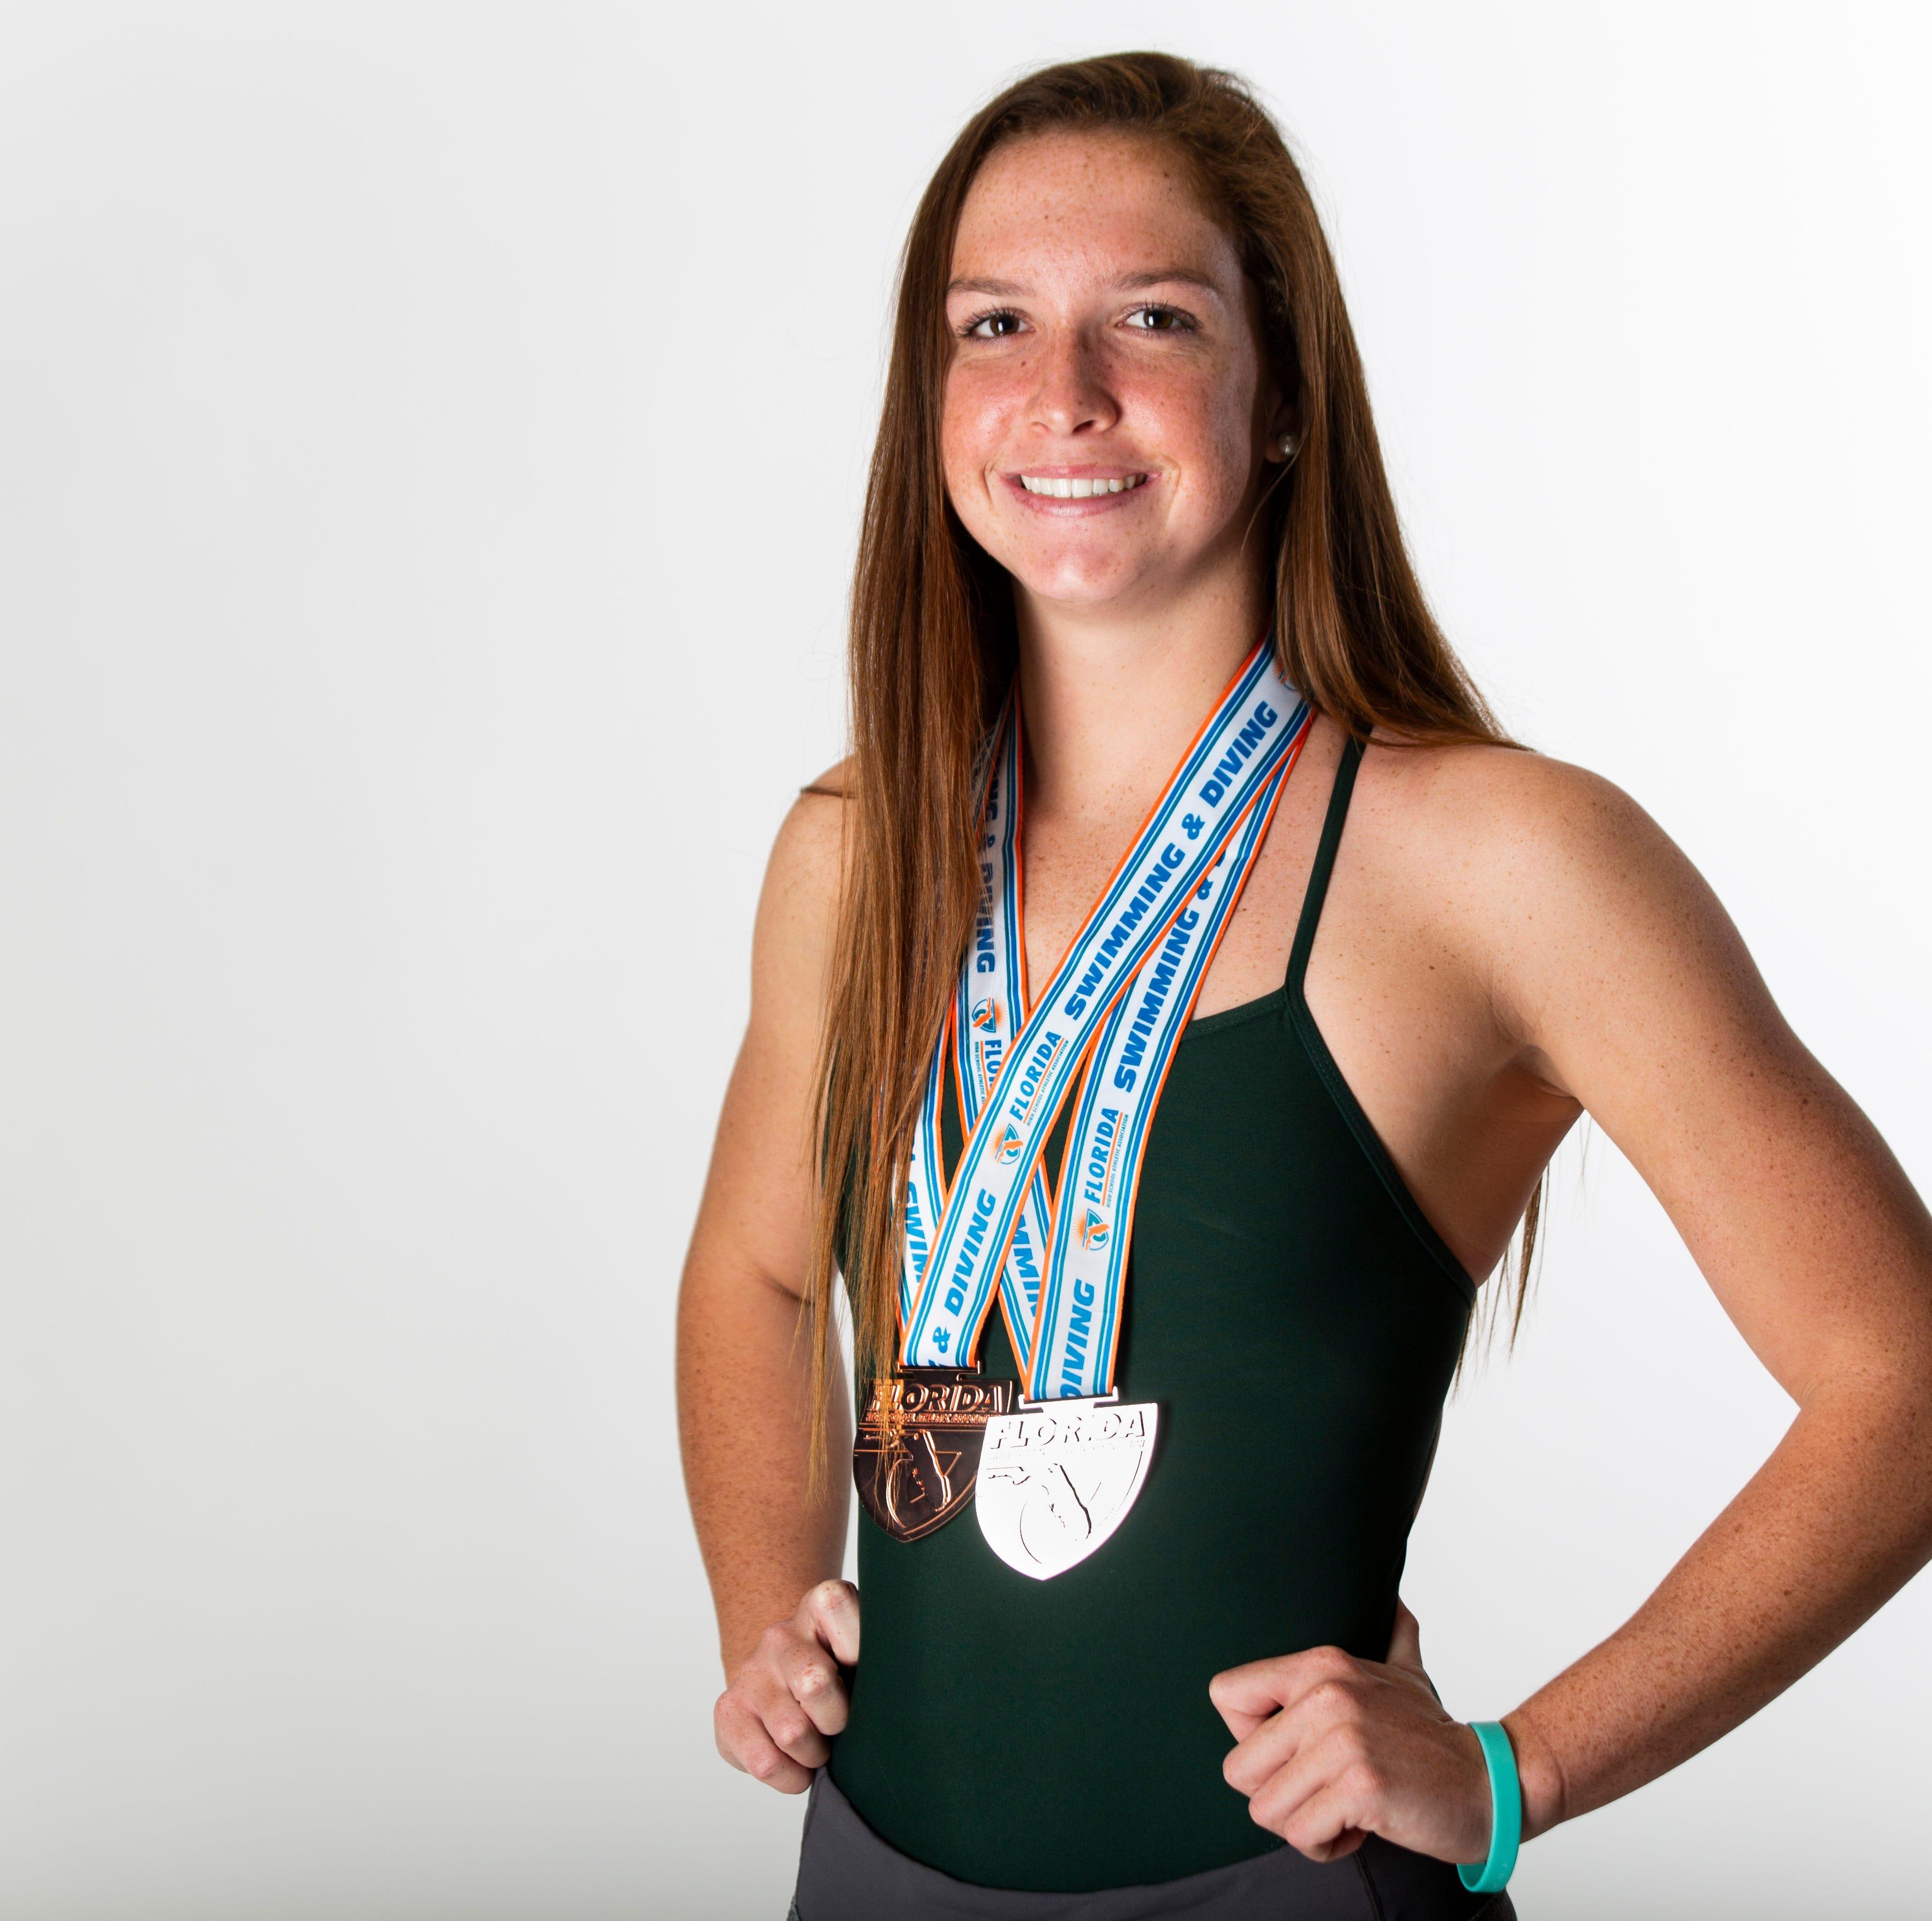 Marco resident Maddy Burt will swim for Arizona in college